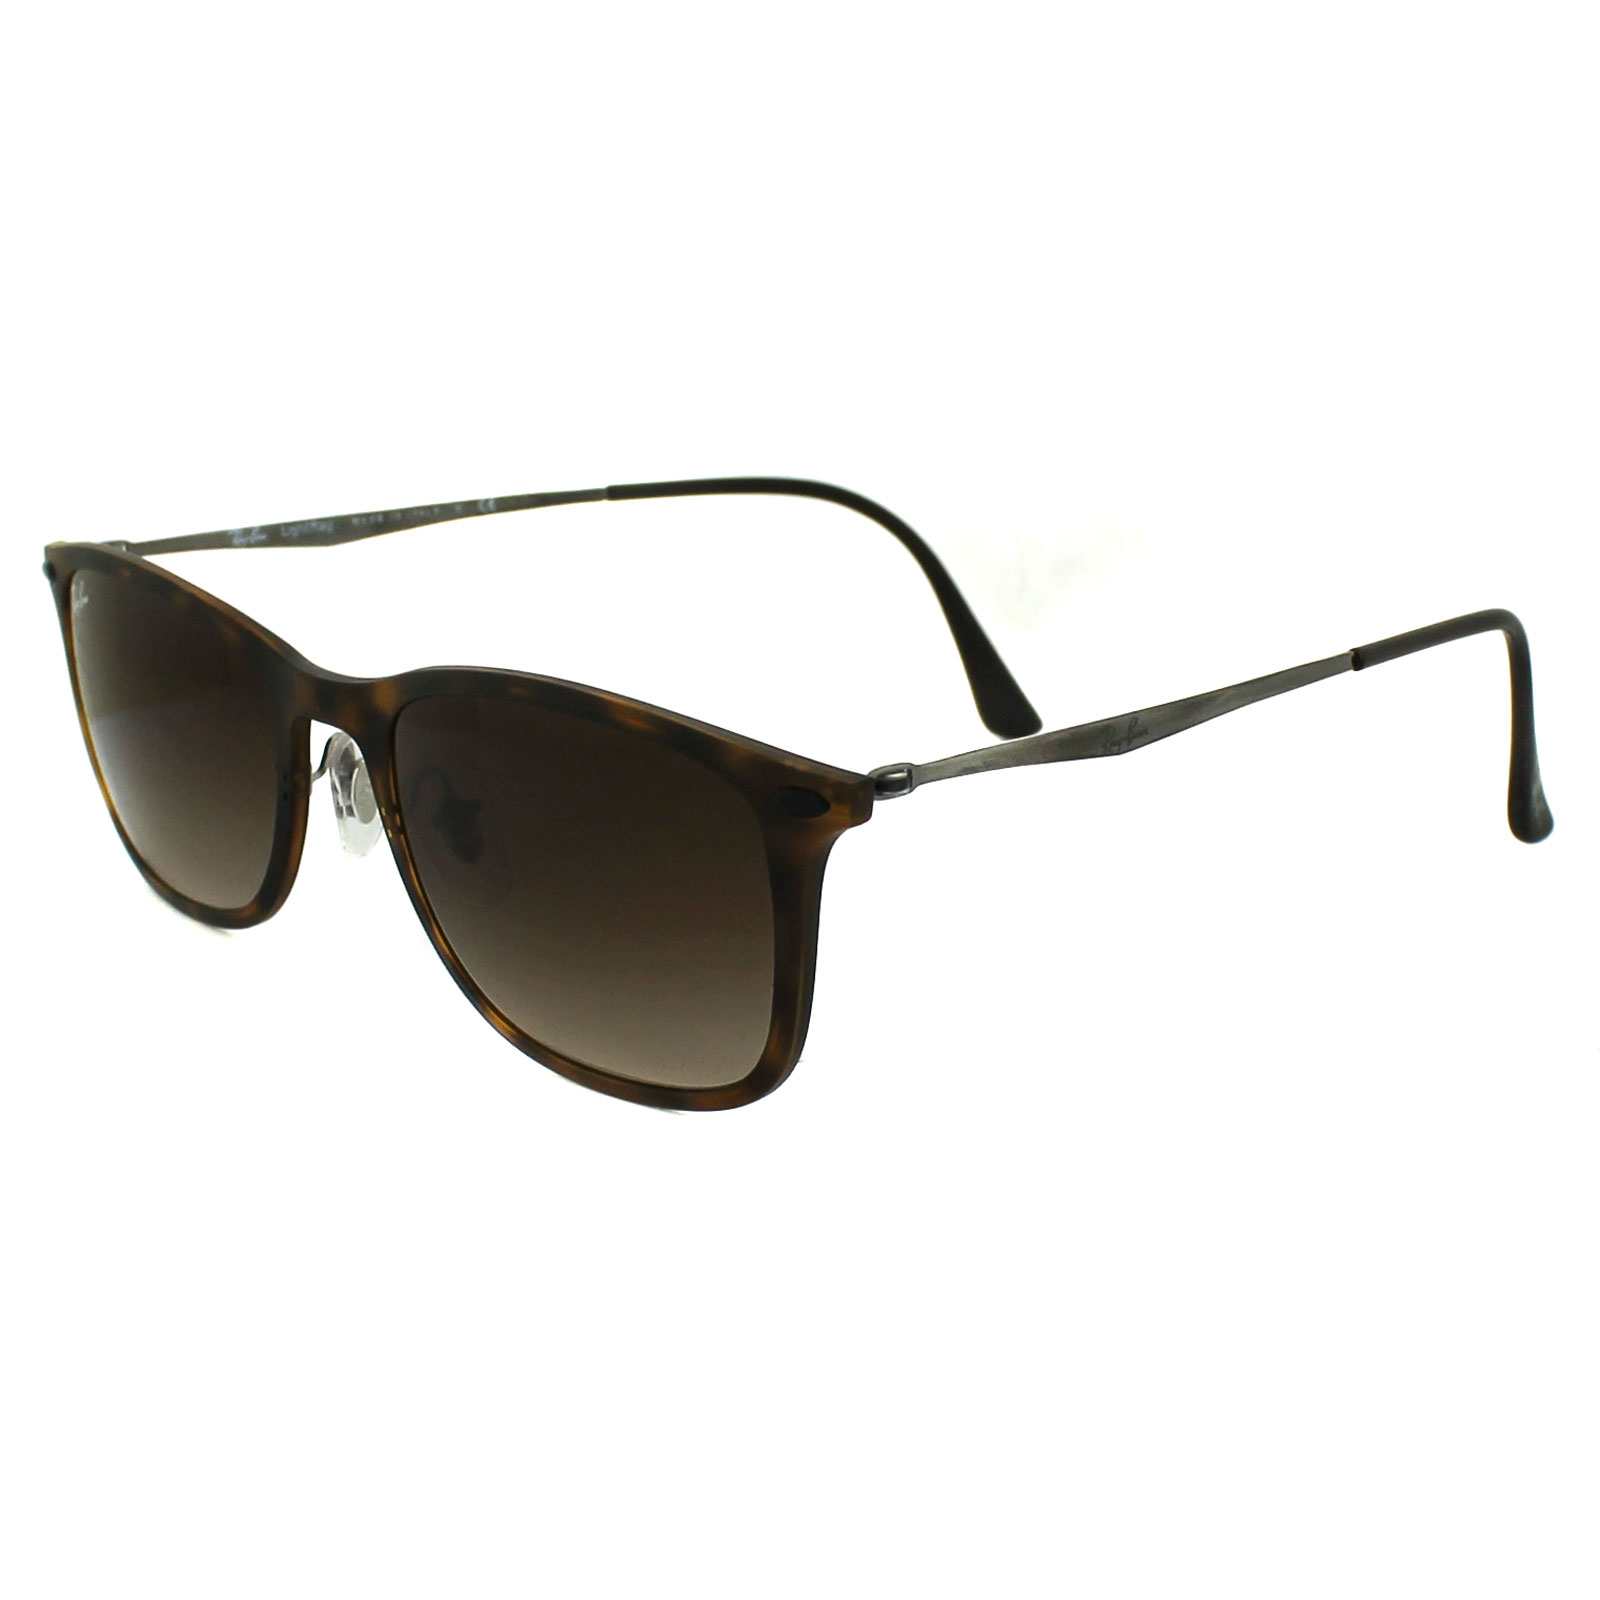 526c315800 Sentinel Ray-Ban Sunglasses New Wayfarer Light Ray 4225 894 13 Tortoise  Brown Gradient